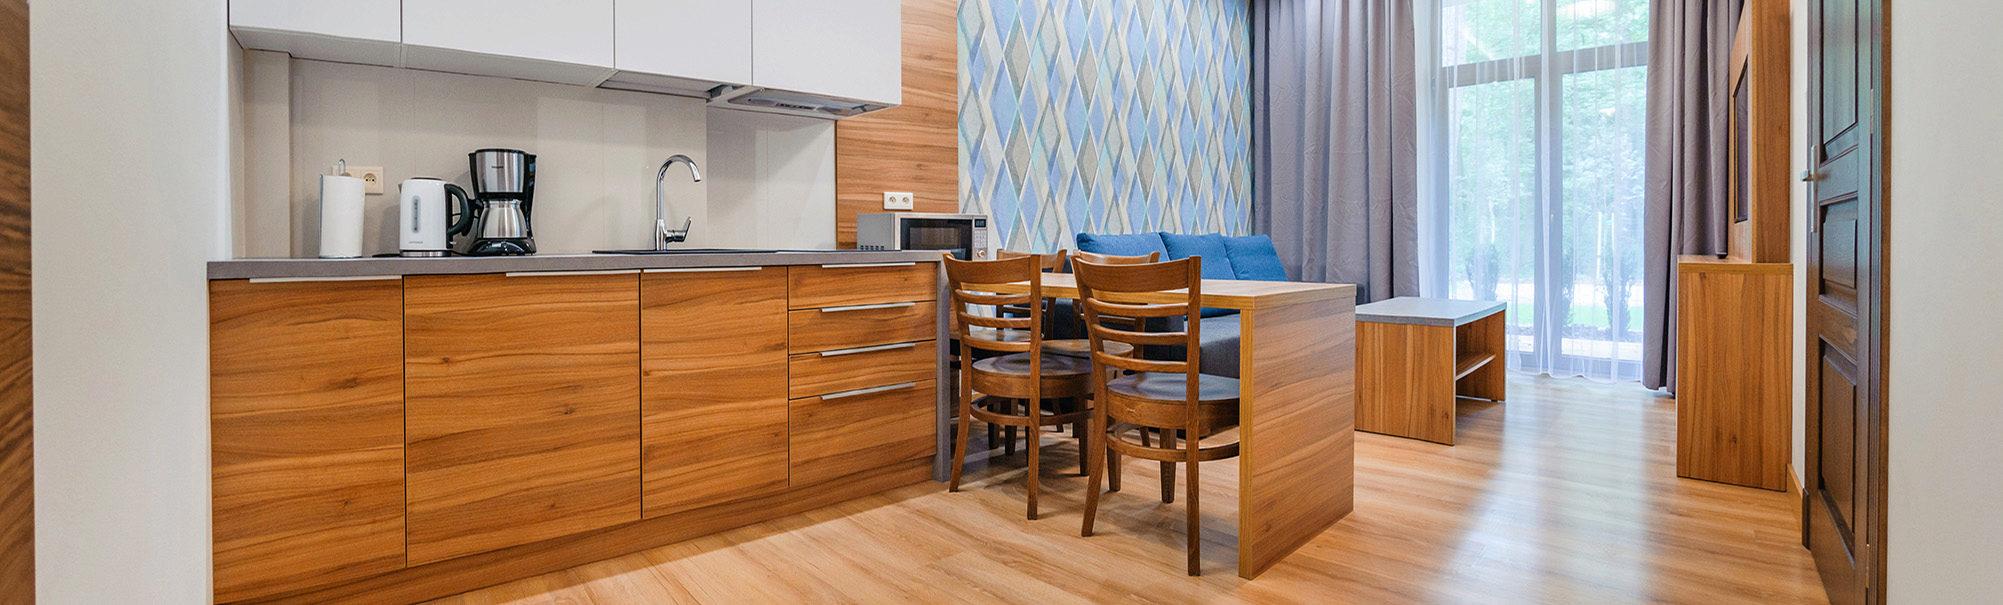 Apartamenty Sun&Snow Apartament A 7 Hel - Cypel Helski